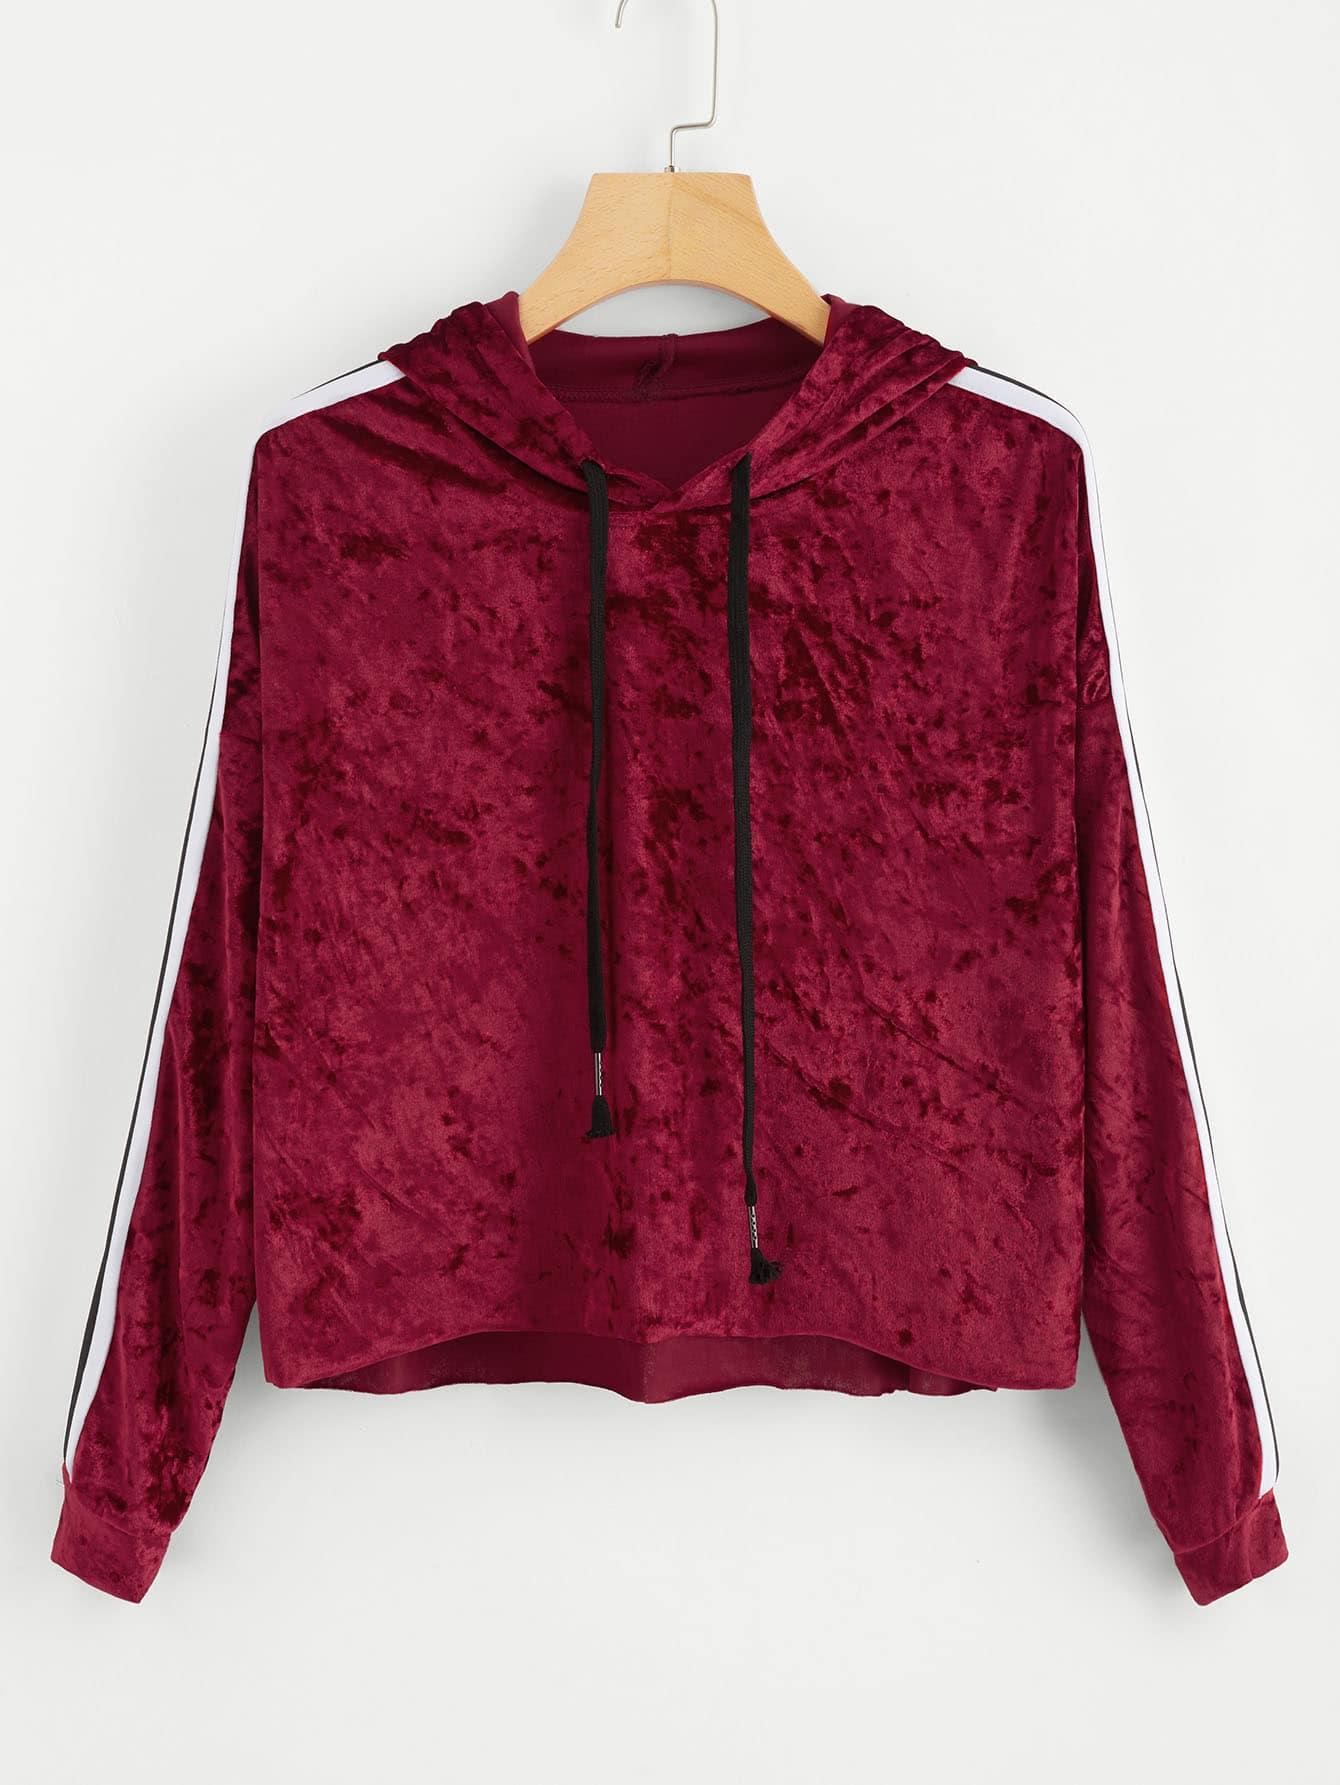 Stripe Tape Drop Shoulder Raw Hem Marled Hoodie drop shoulder marled sweatshirt dress with corset belt